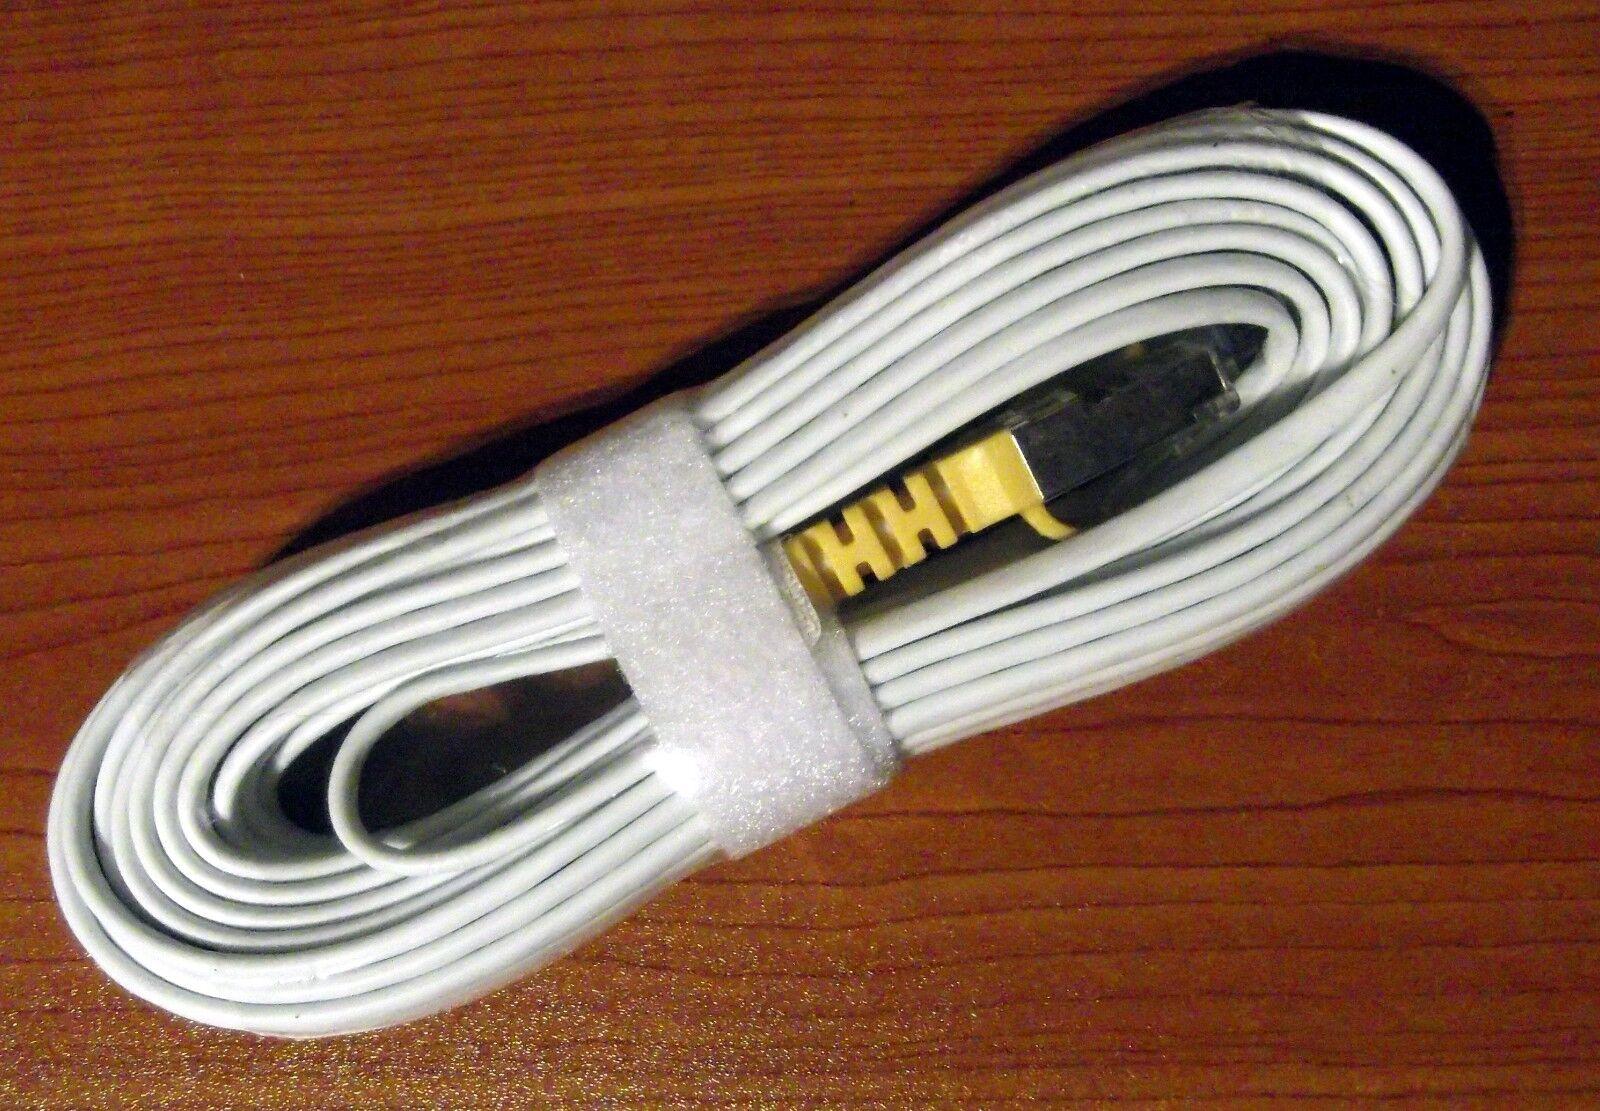 10m Lightweight Discreet Ethernet Cable/RJ45 For Streaming / IPTV / Media - BNIB